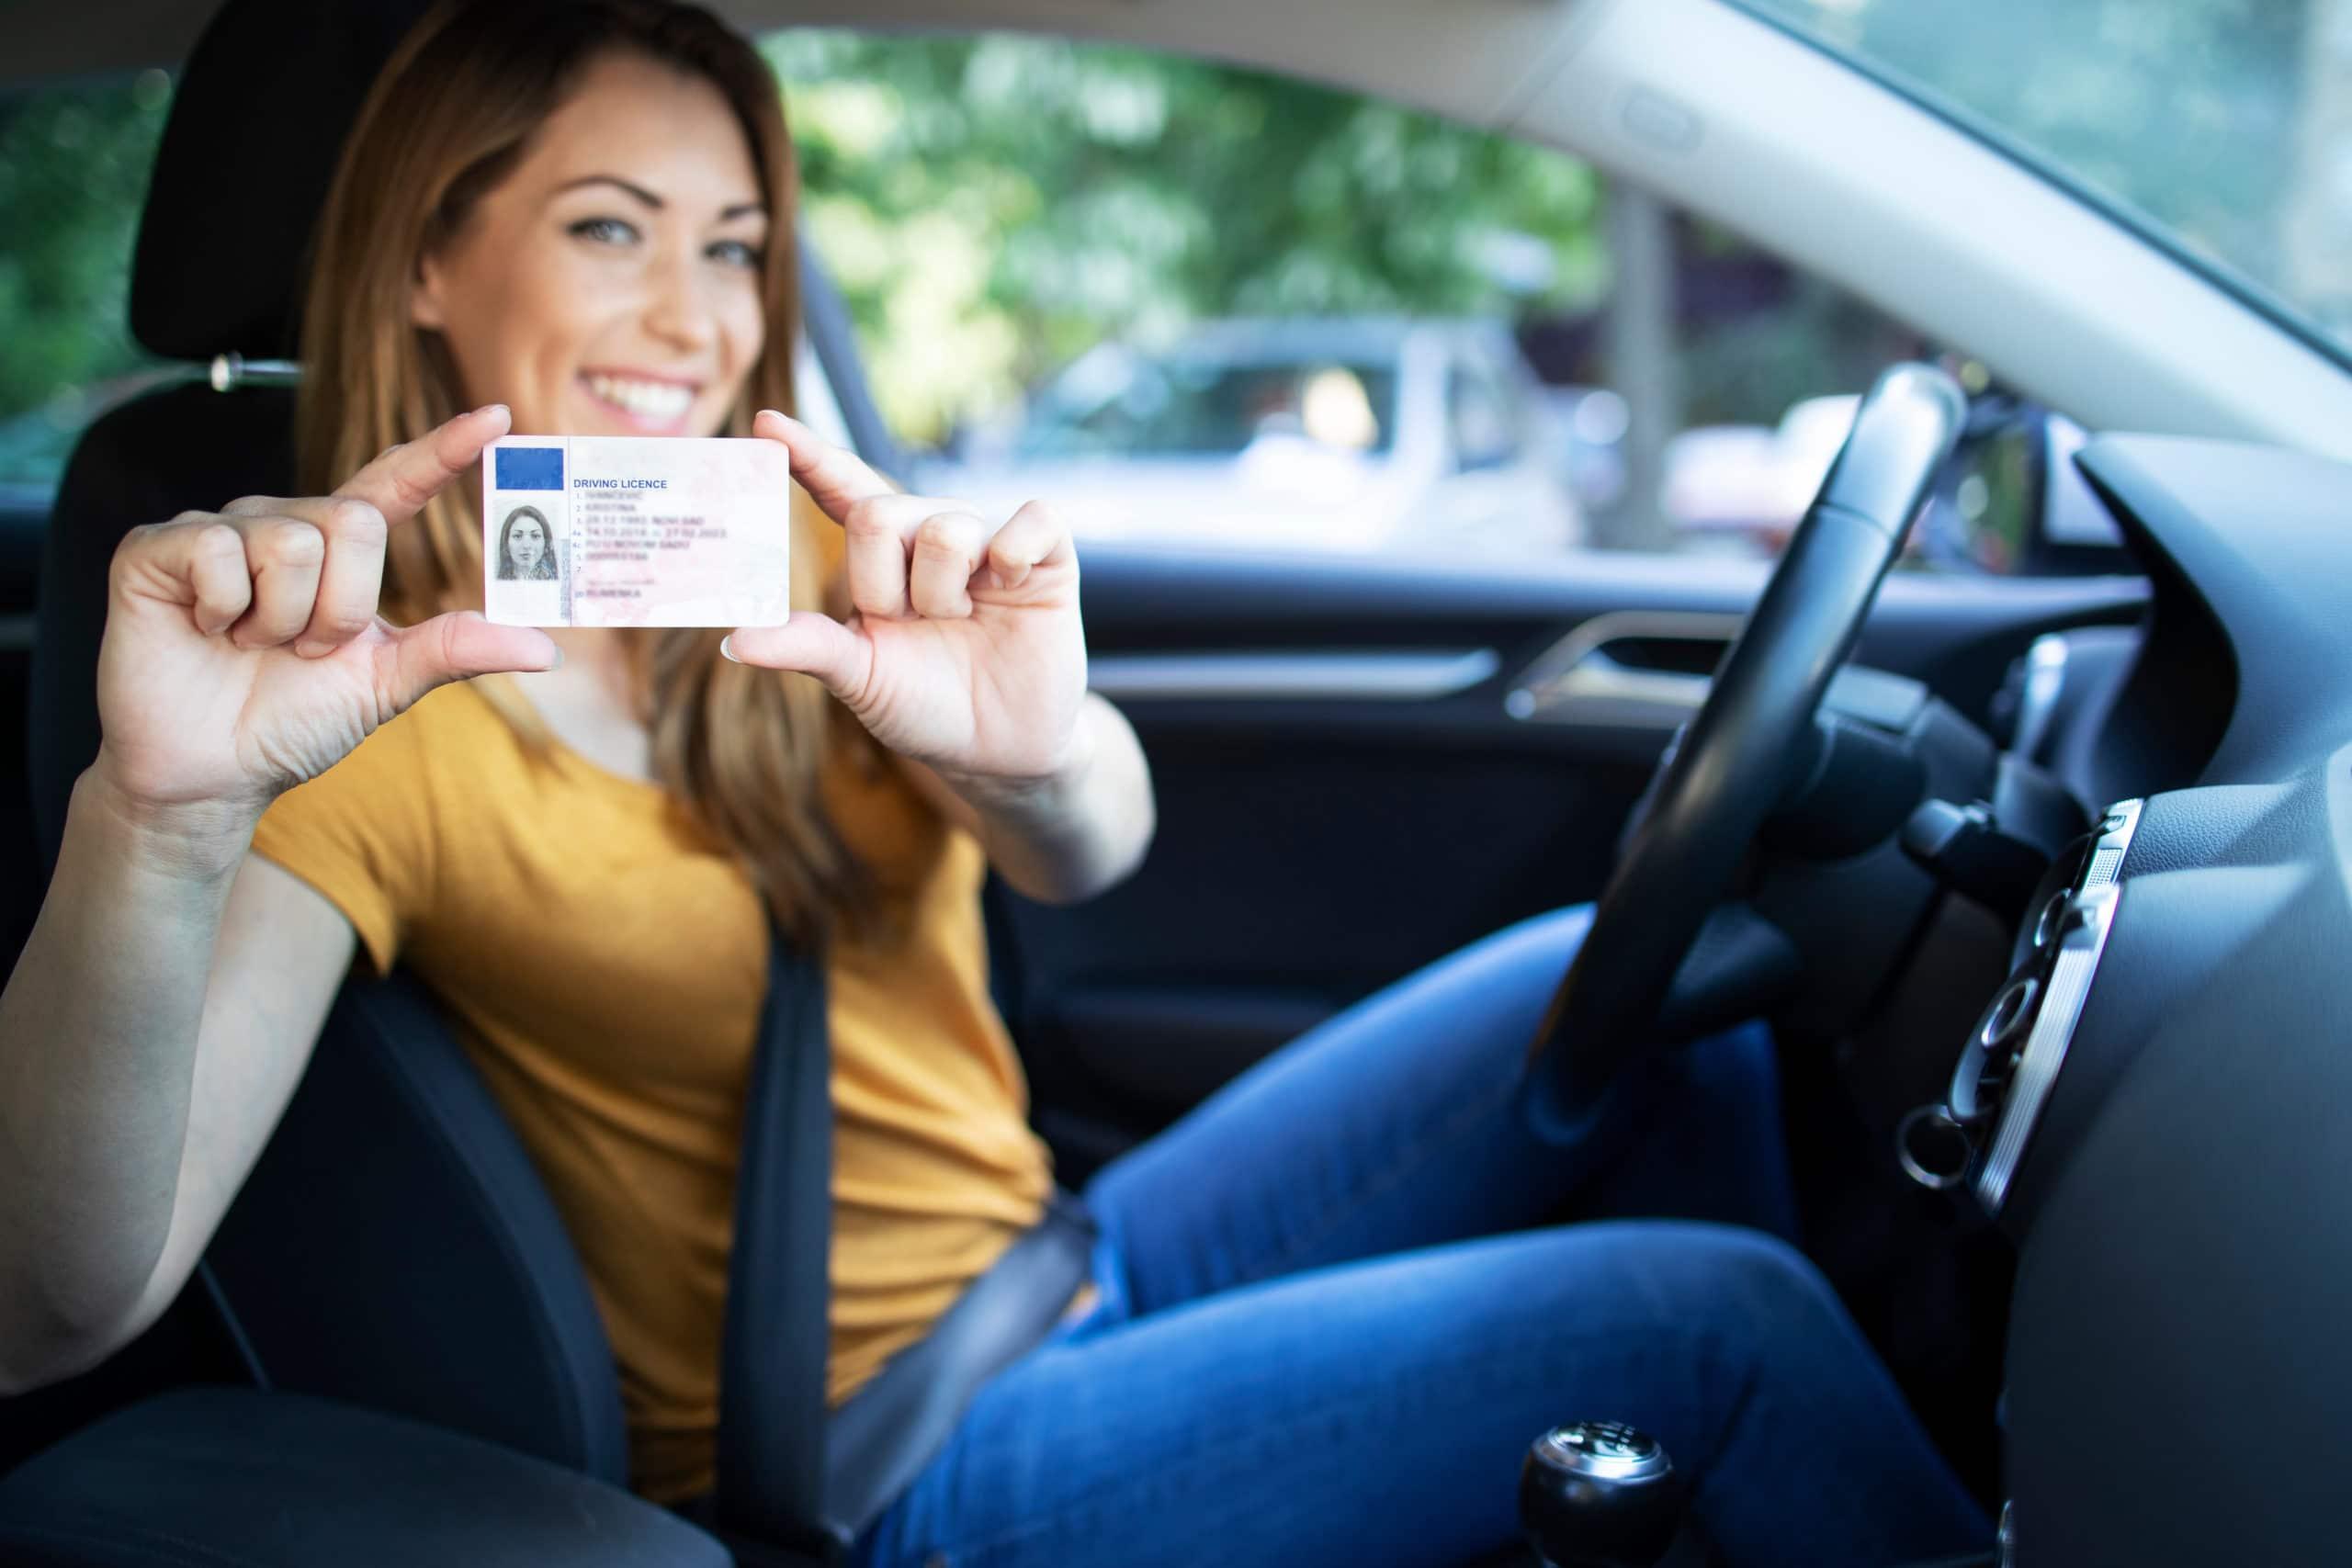 Tramicar duplicado carnets conducir